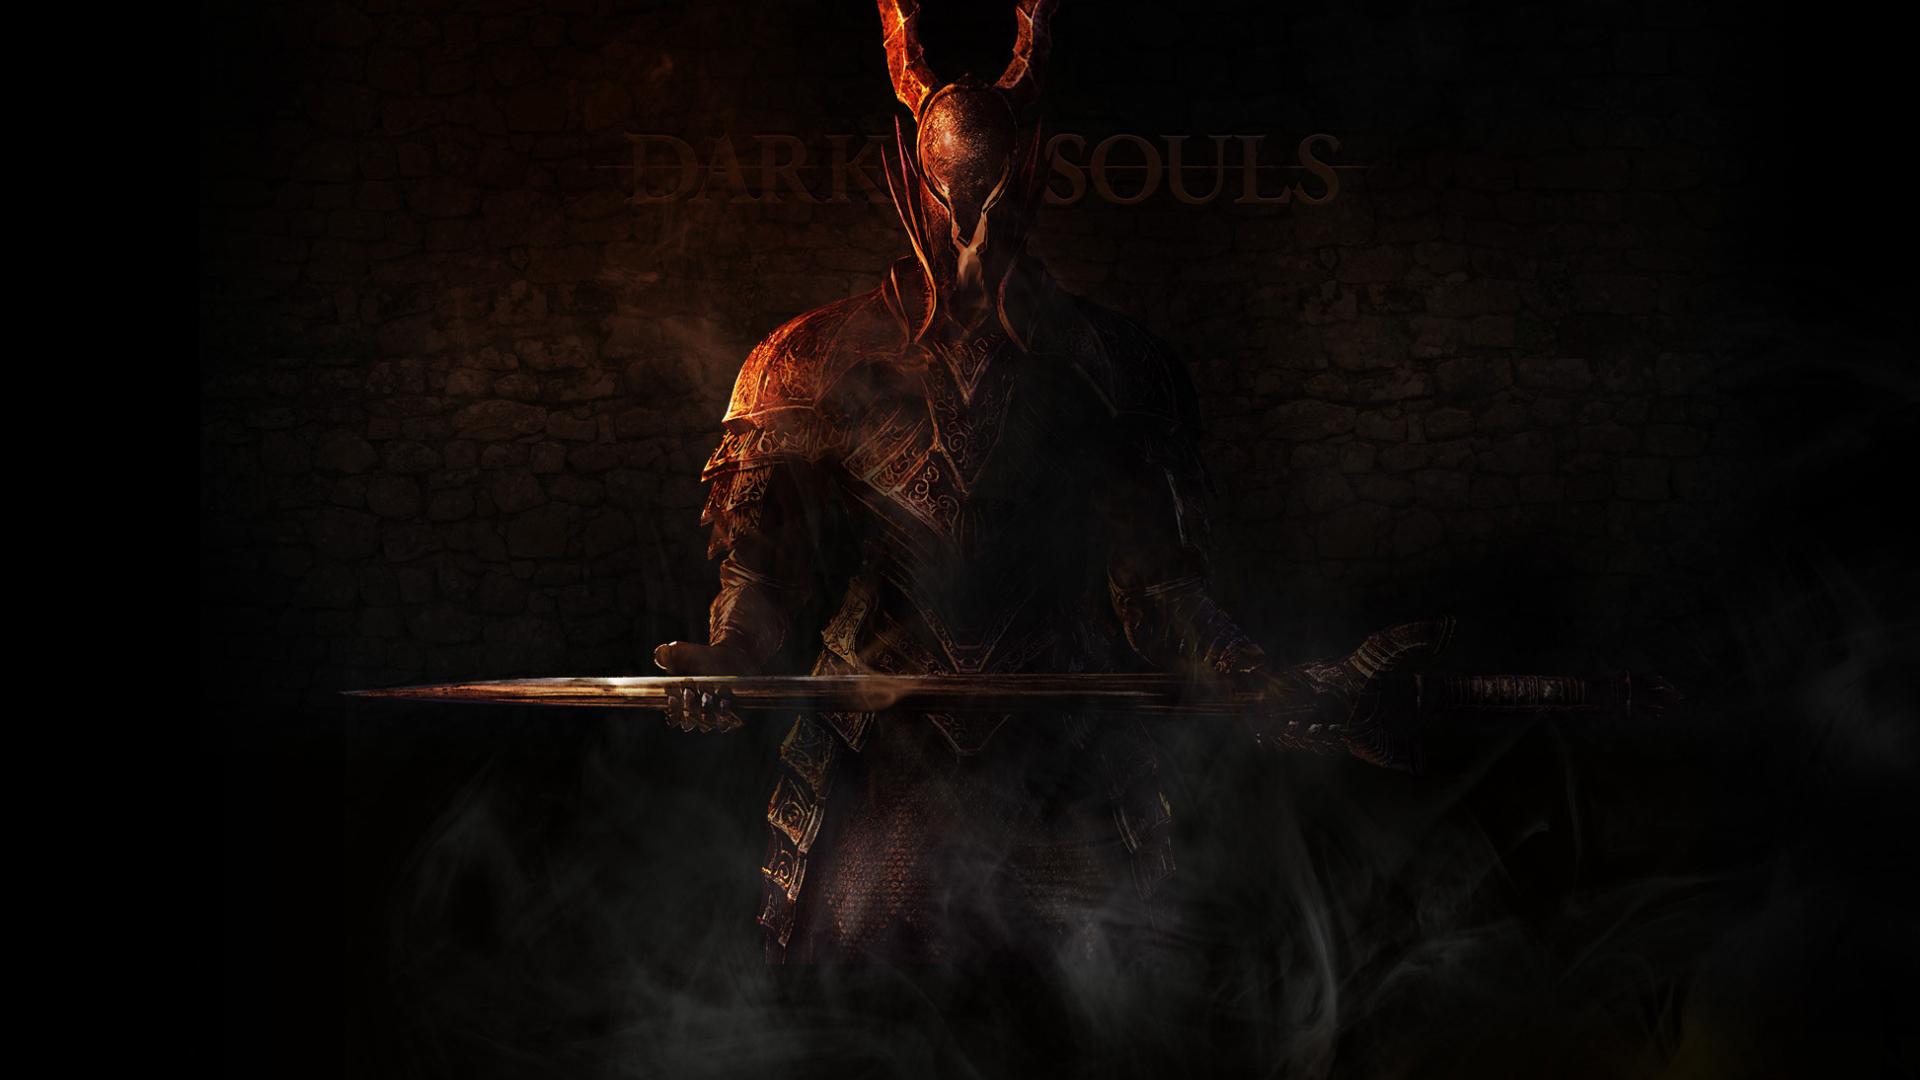 1920x1080 Dark Souls Knight Undead 1080p Laptop Full Hd